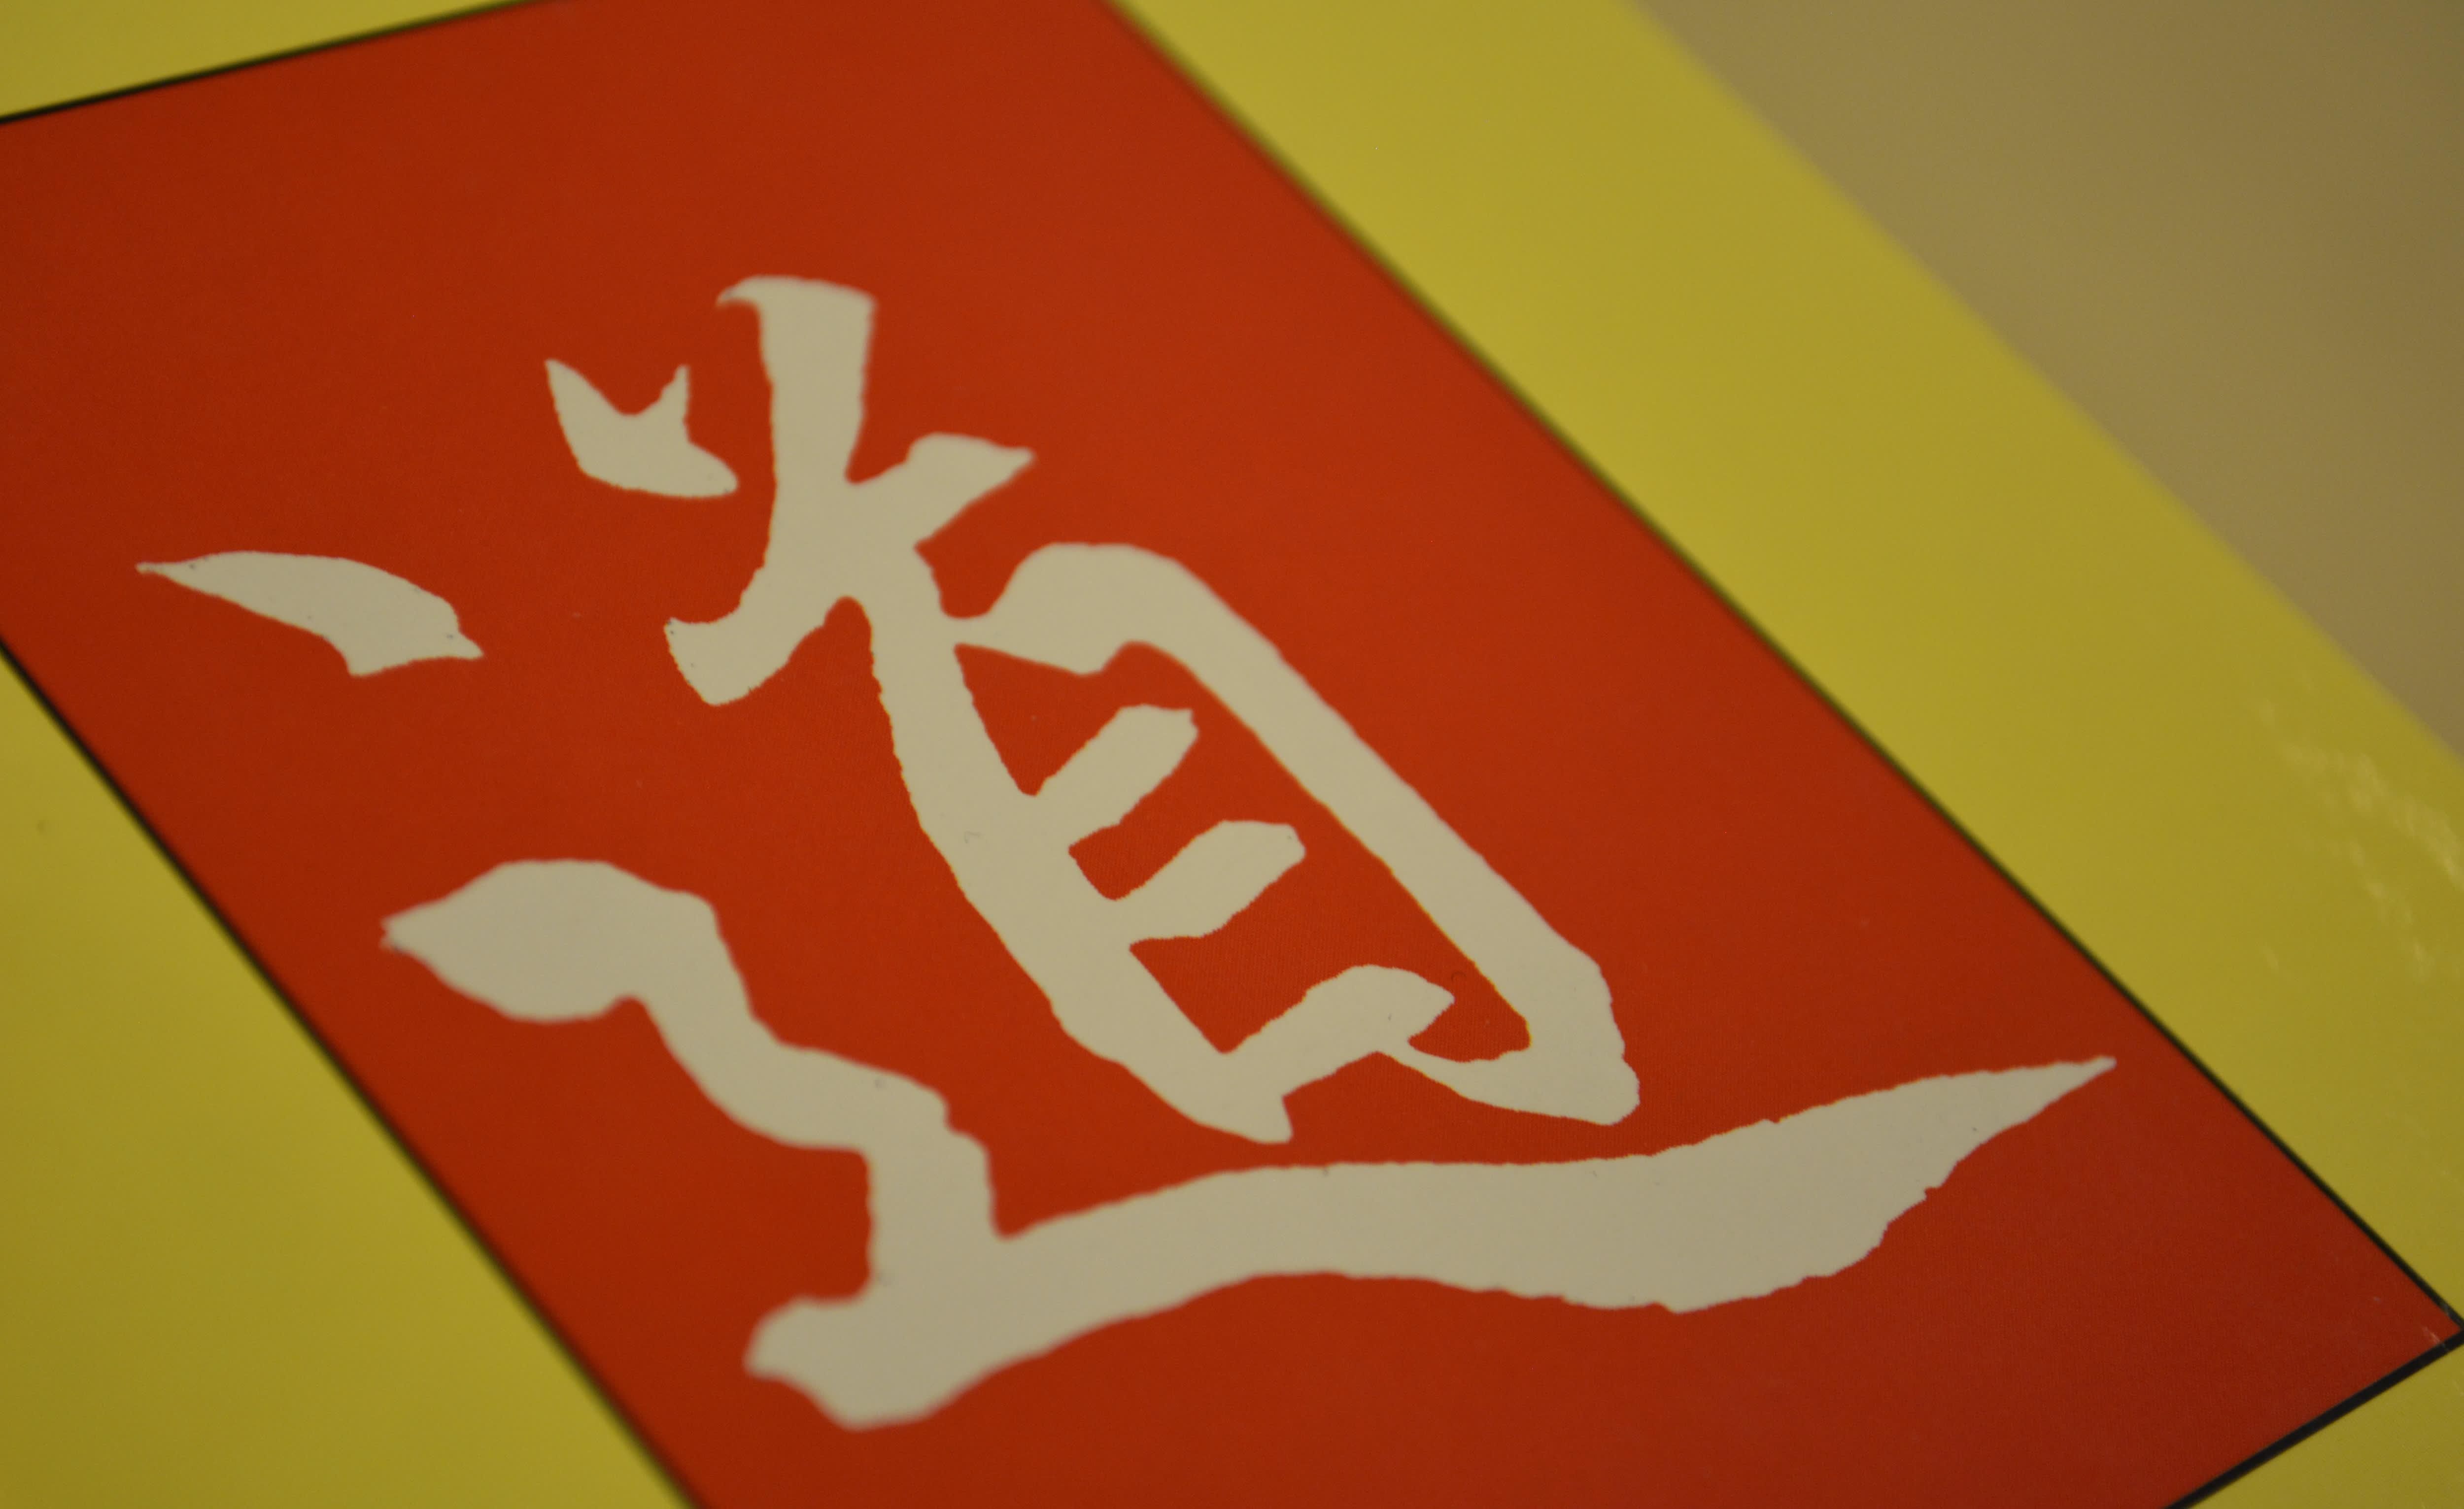 Taolaisuuden symboli.